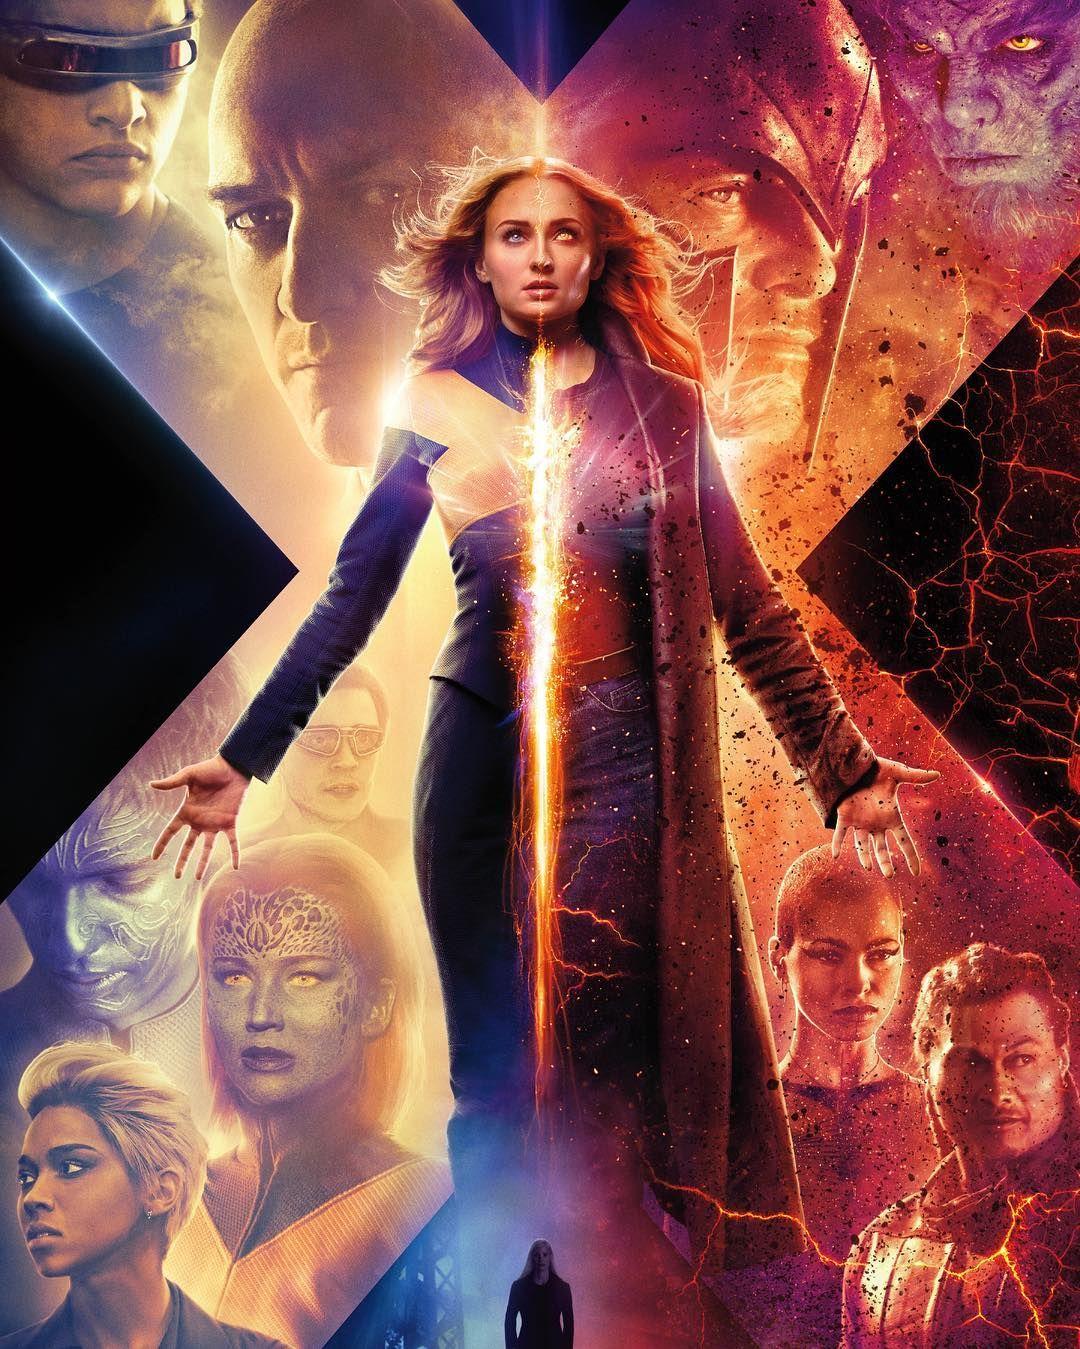 Sophie Turner On Instagram The New Darkphoenix Poster Has Arrived Trailer Tomorrow Night Dark Phoenix X Men Full Movies